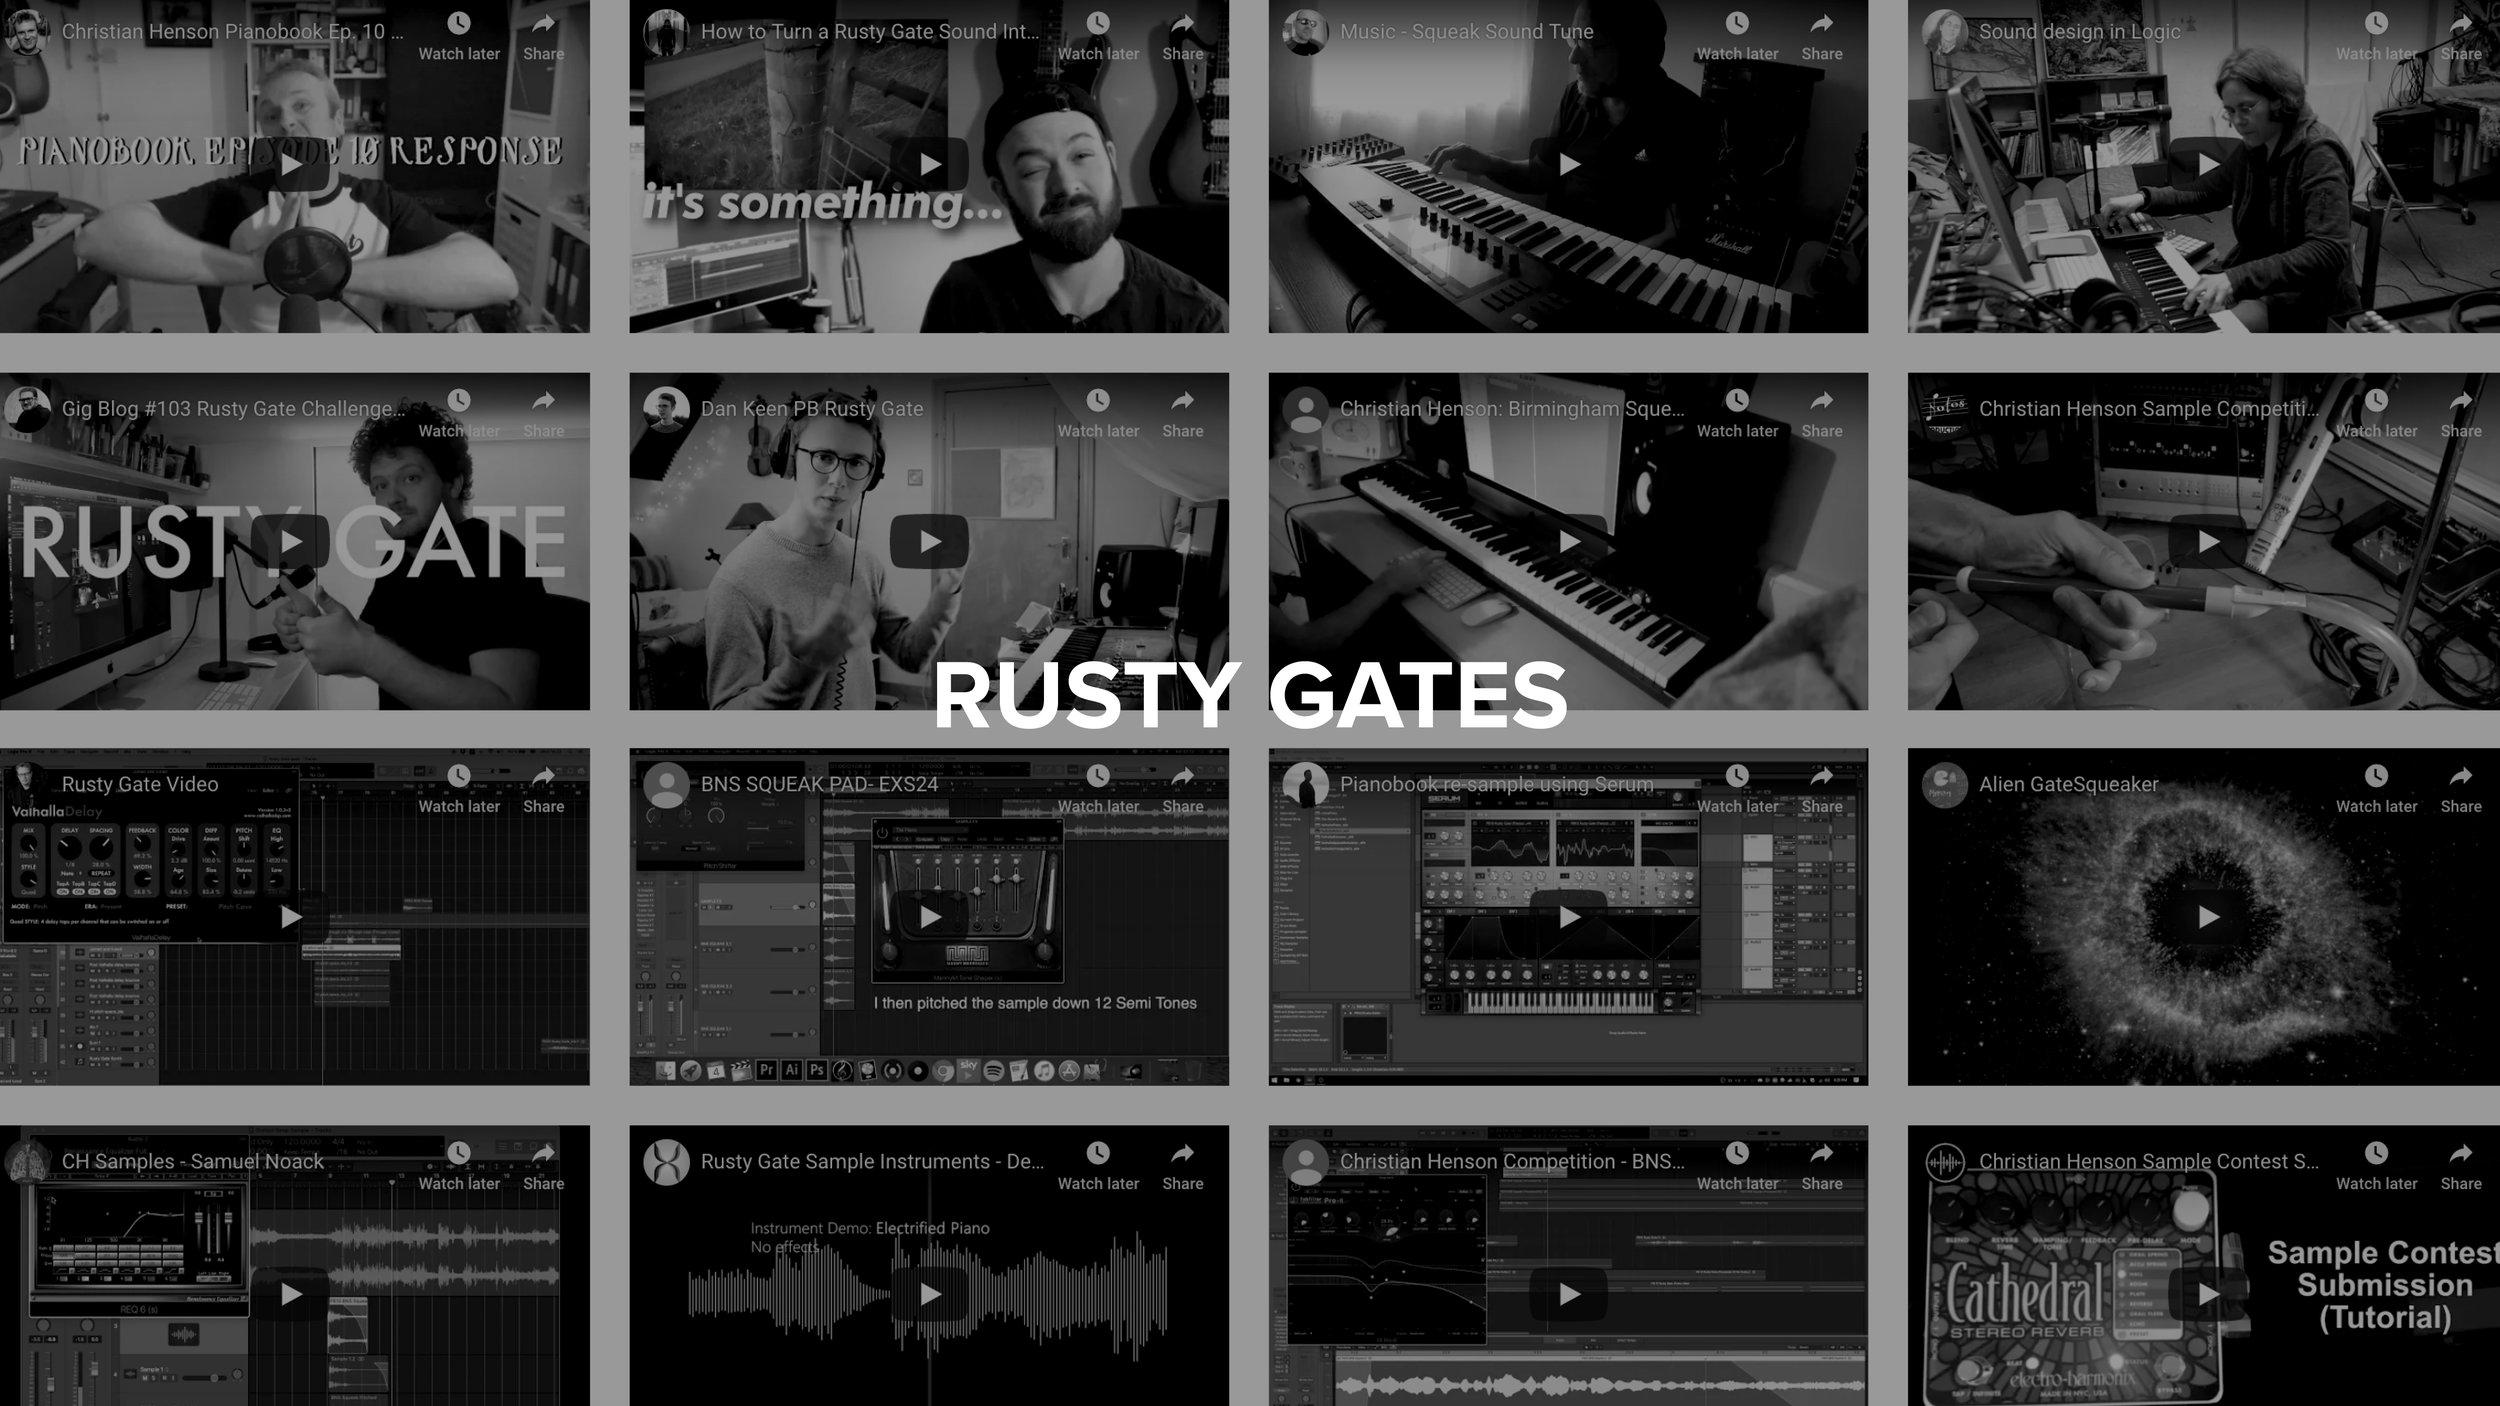 Rusty Gates.jpg